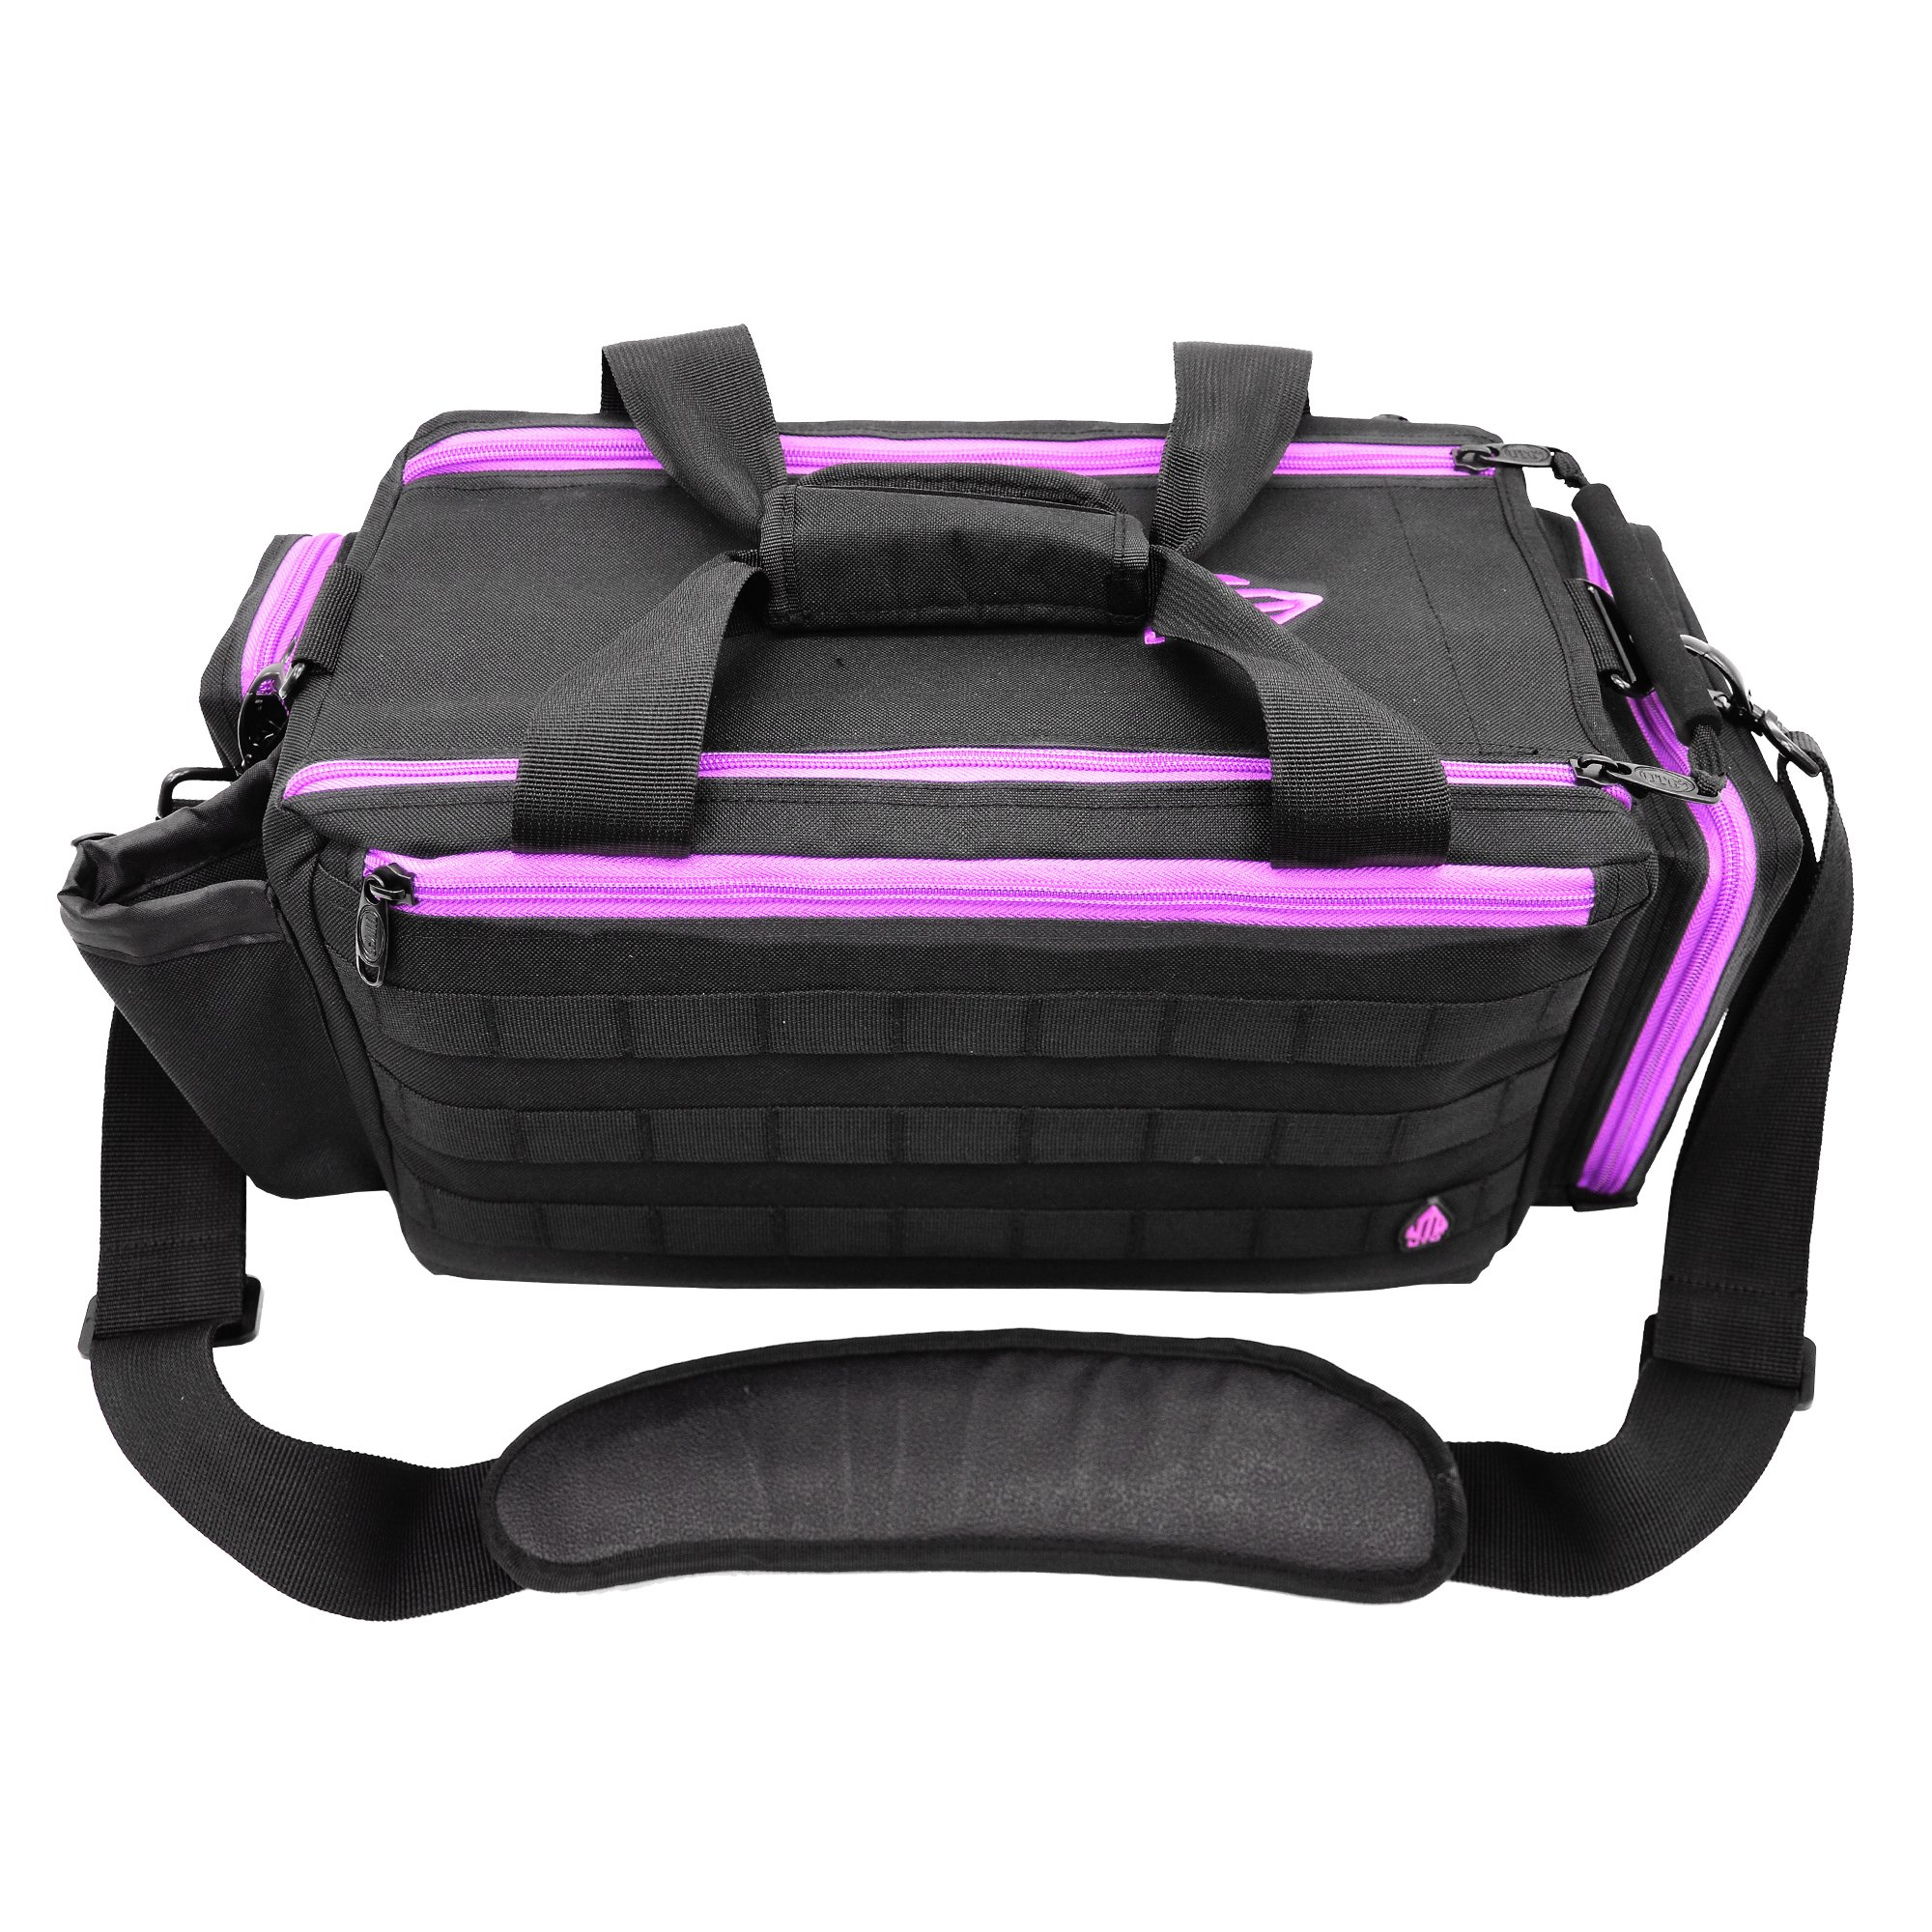 UTG All in One Range/Utility Go Bag, Black/Violet, 21'' x 10'' x 9''